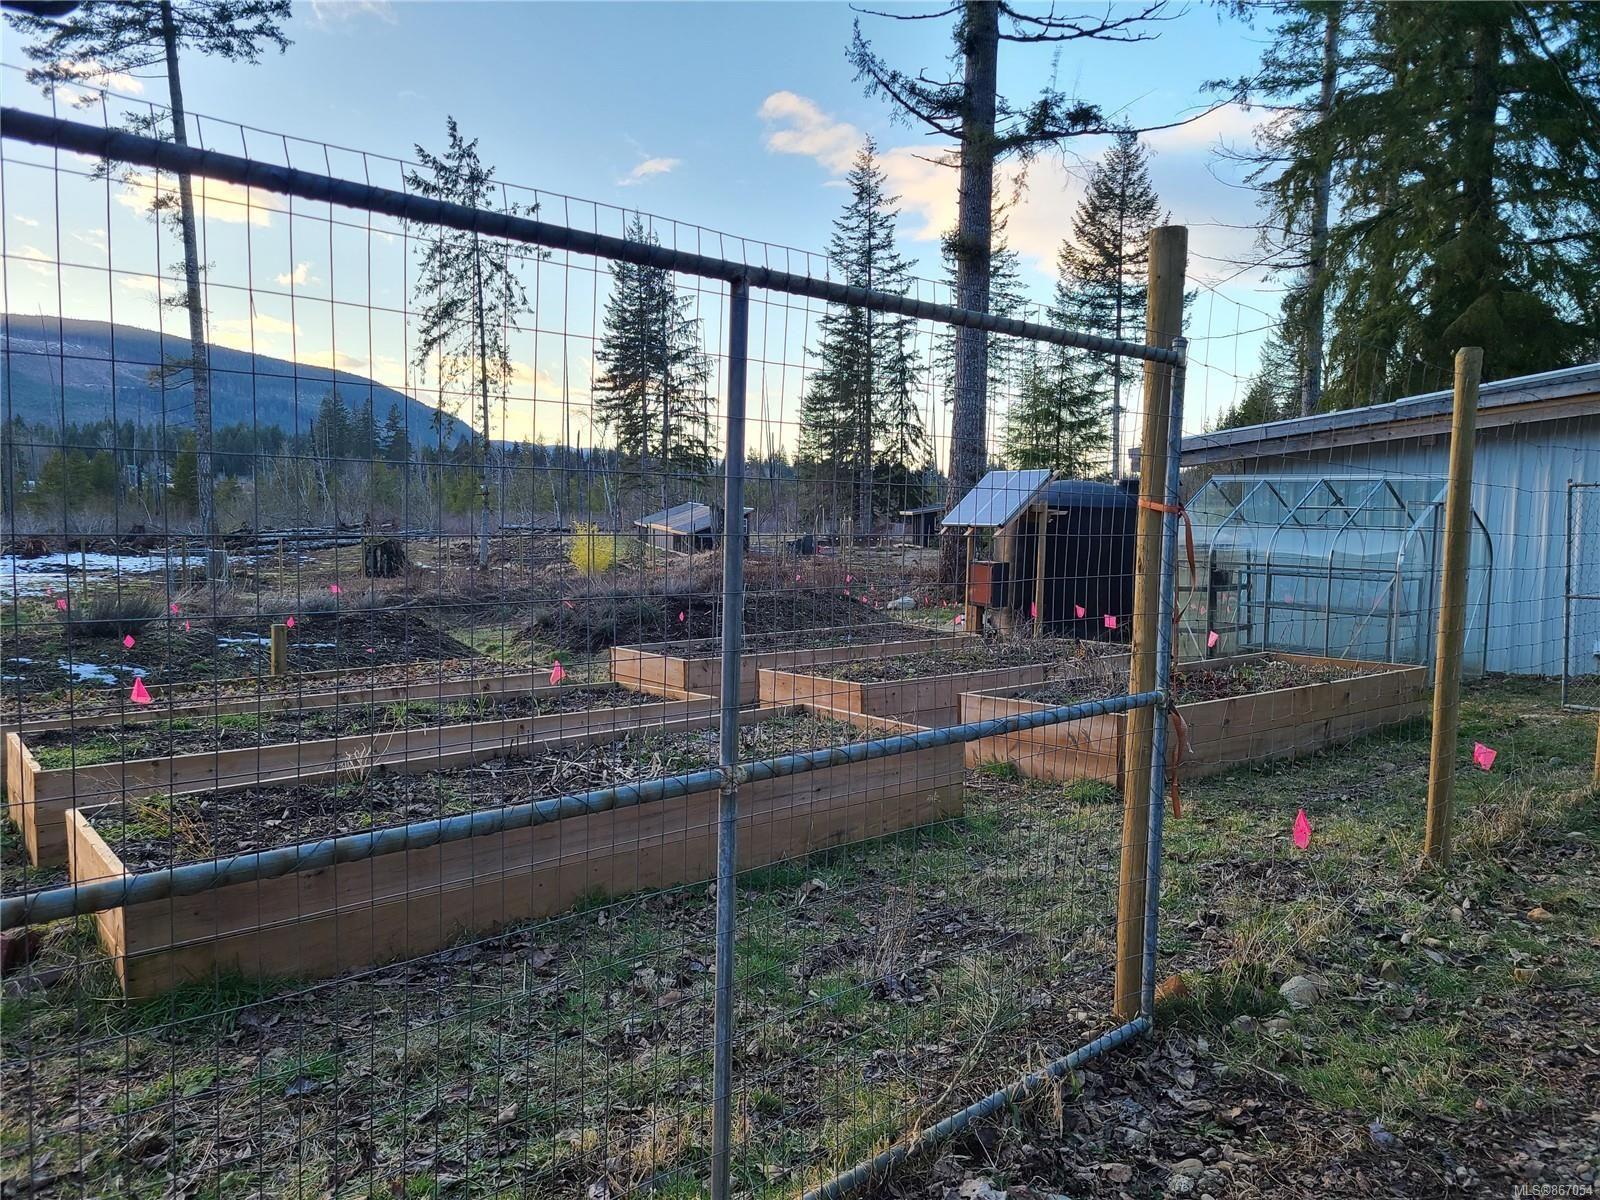 Photo 26: Photos: 2056 Spike Rd in : CV Merville Black Creek House for sale (Comox Valley)  : MLS®# 867054